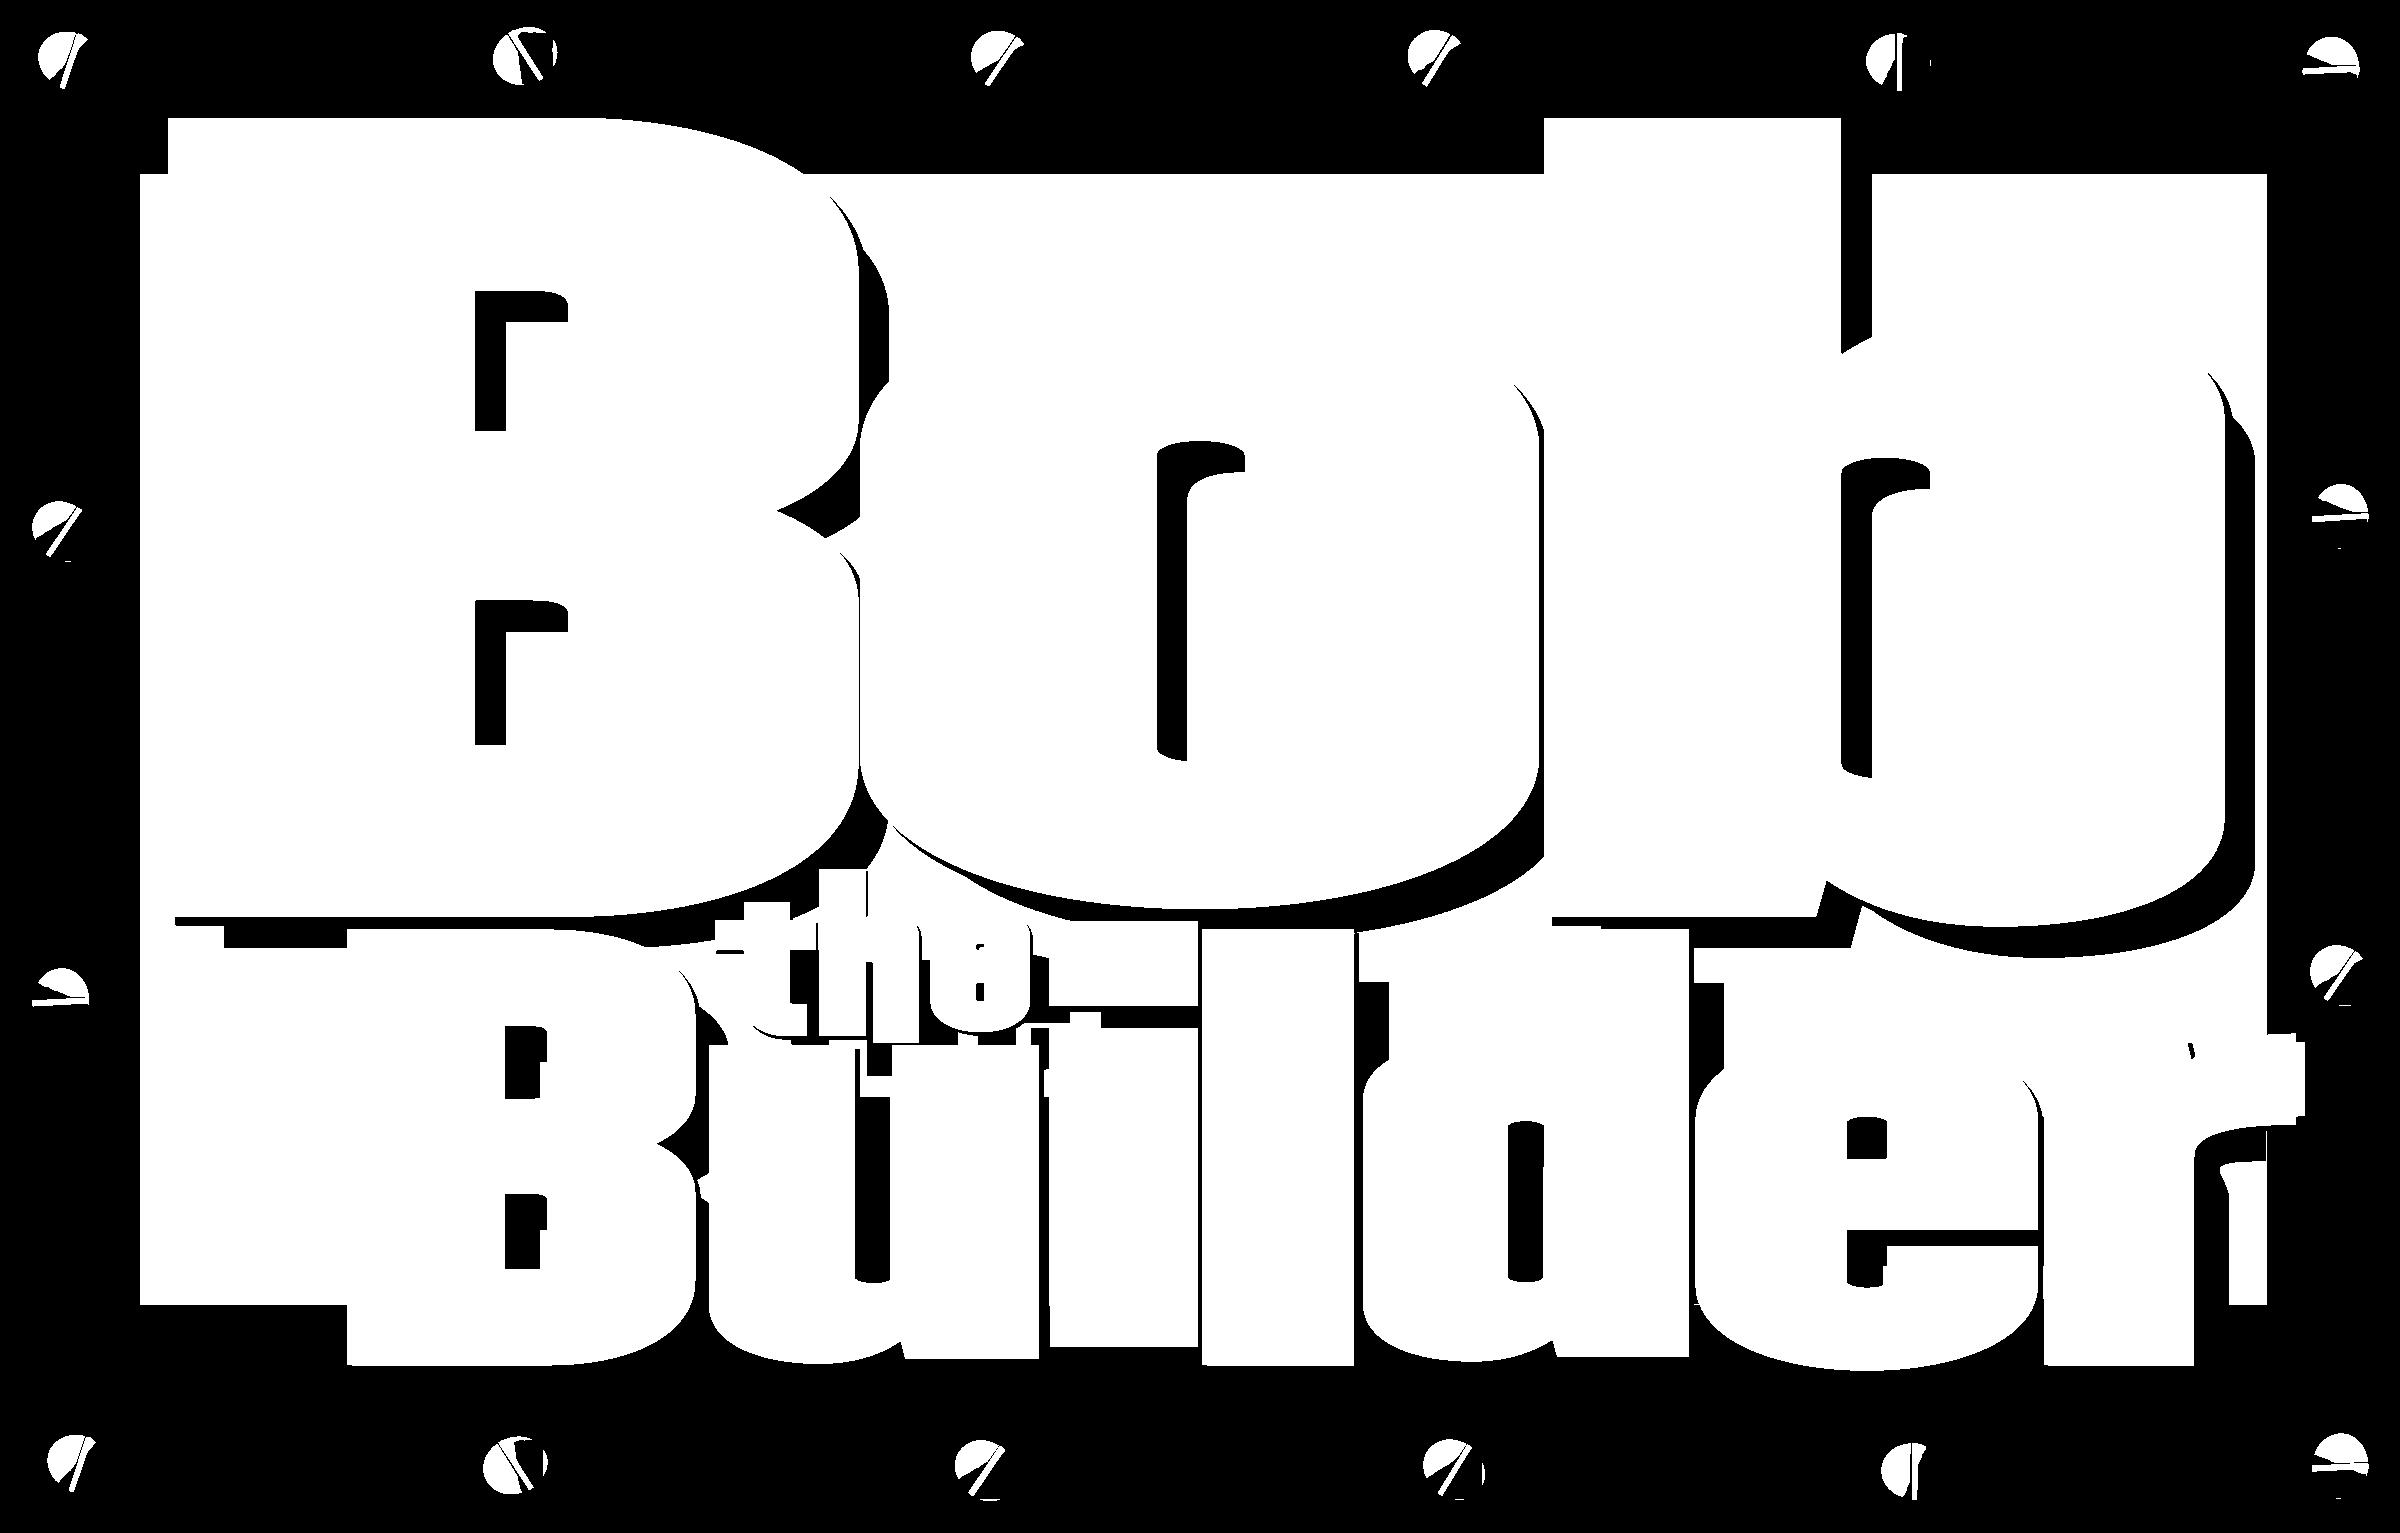 Bob the Builder Logo PNG Transparent & SVG Vector.